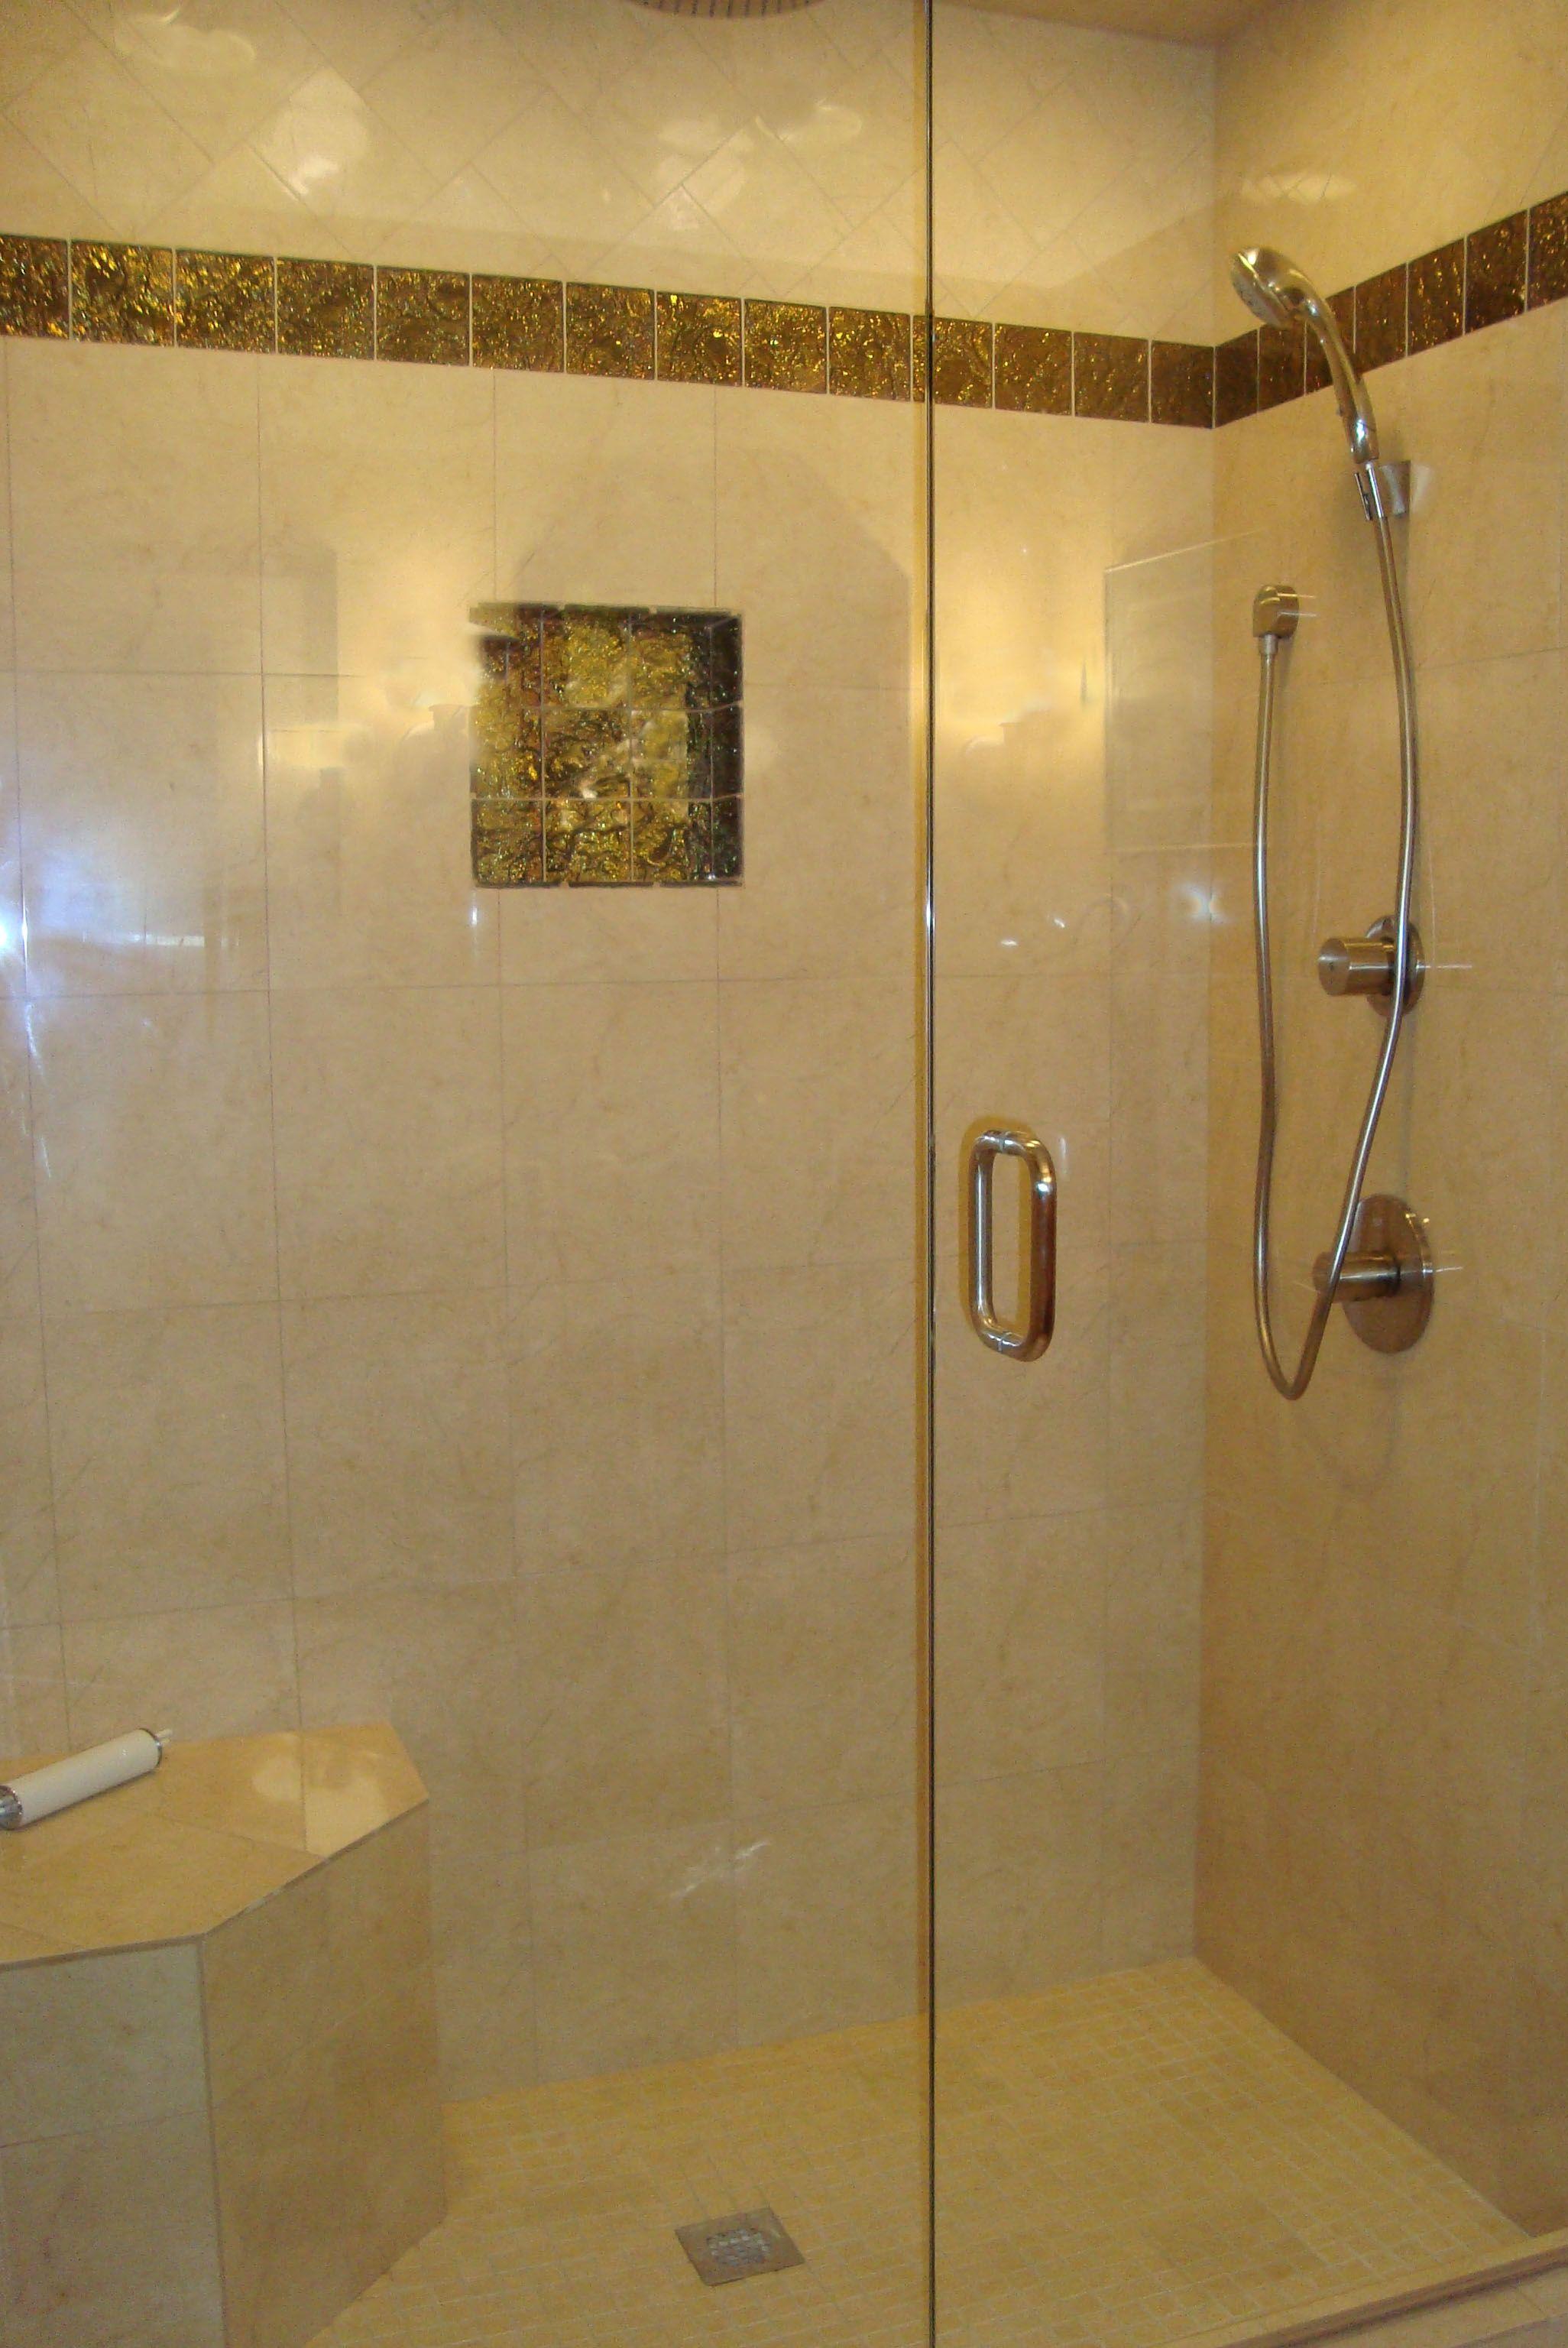 Pin By Jsg Oceana On Tasteful Tile Steam Showers Bathroom